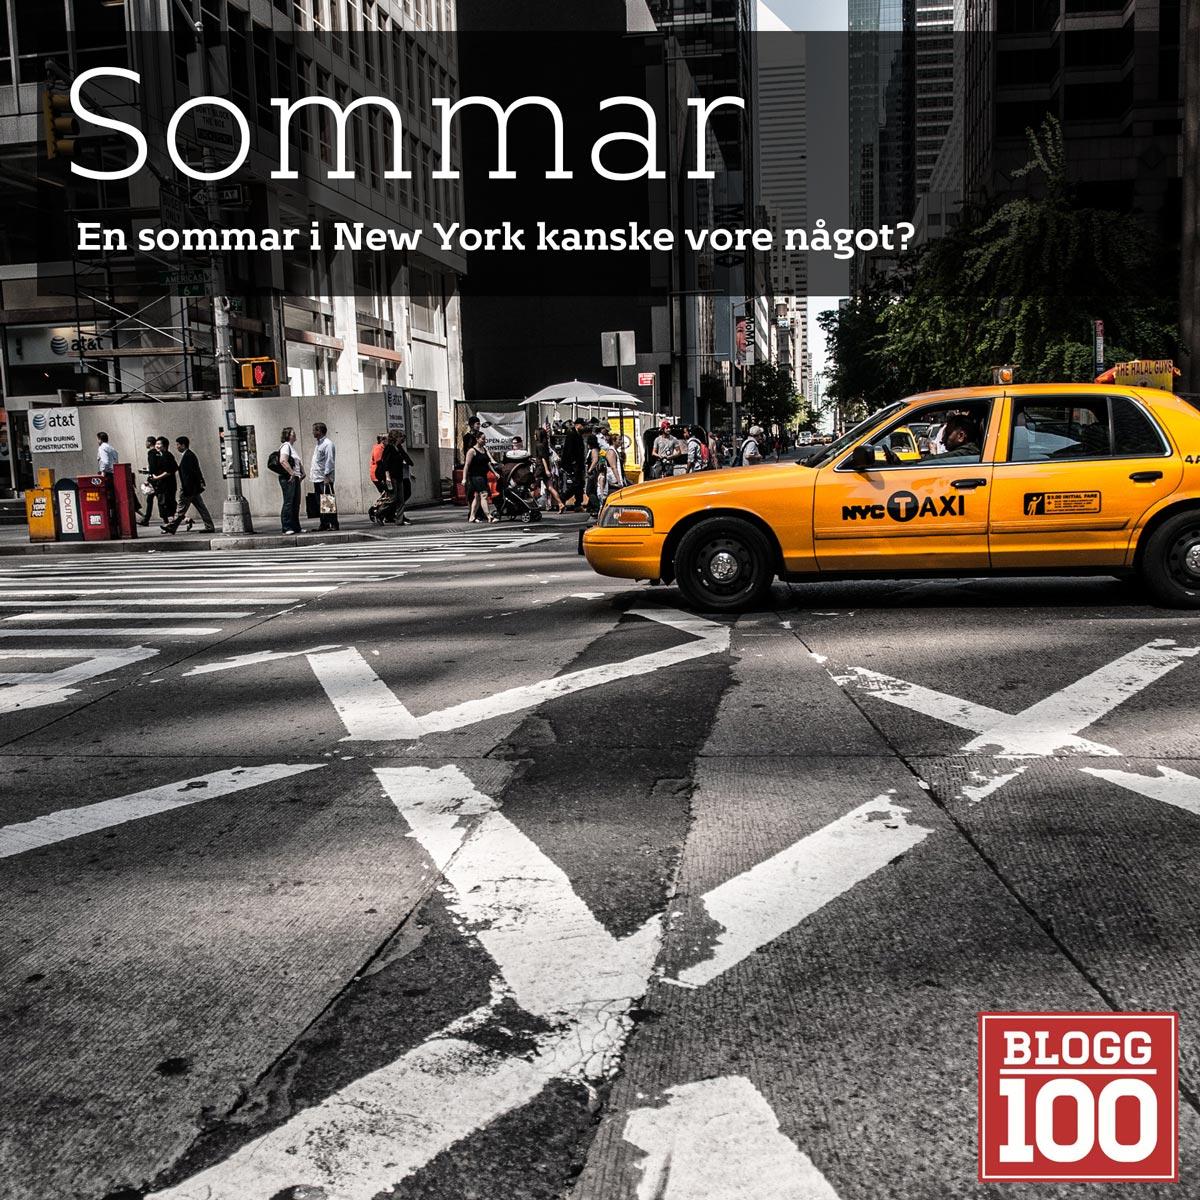 Sommar i New York? #blogg100 #fb